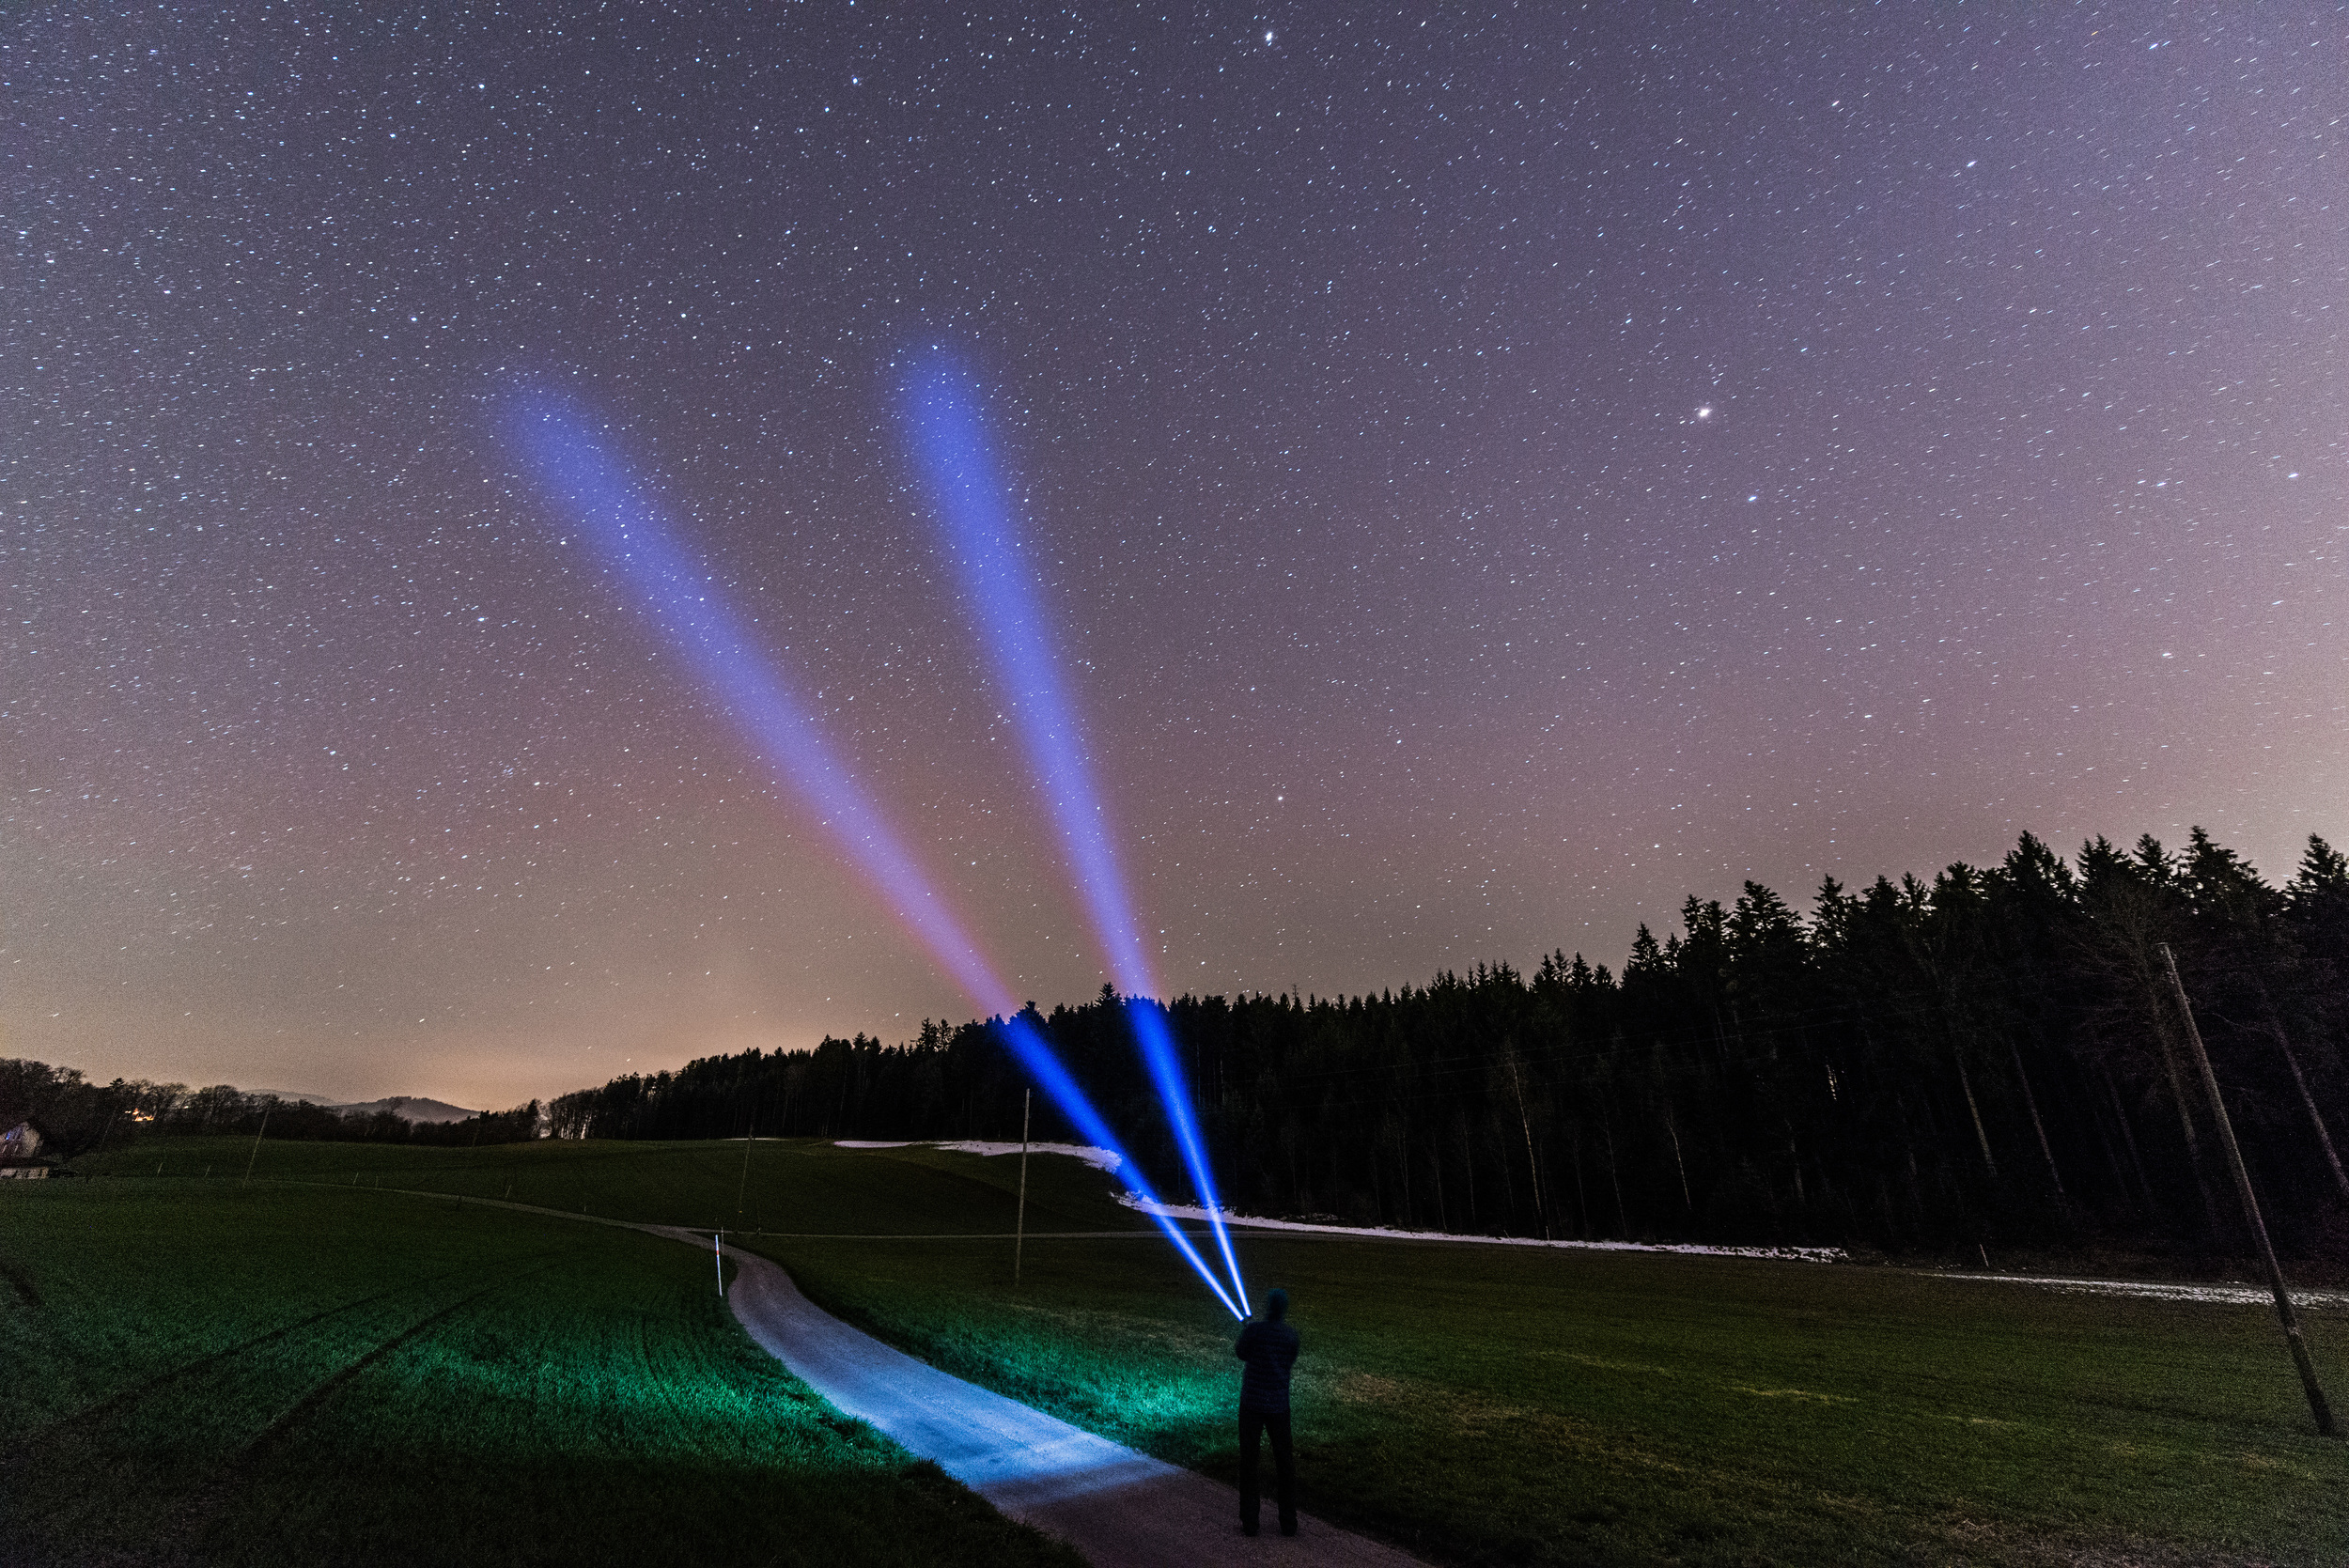 2014 03 28 Sterne Dentenberg-2 kleiner.jpg